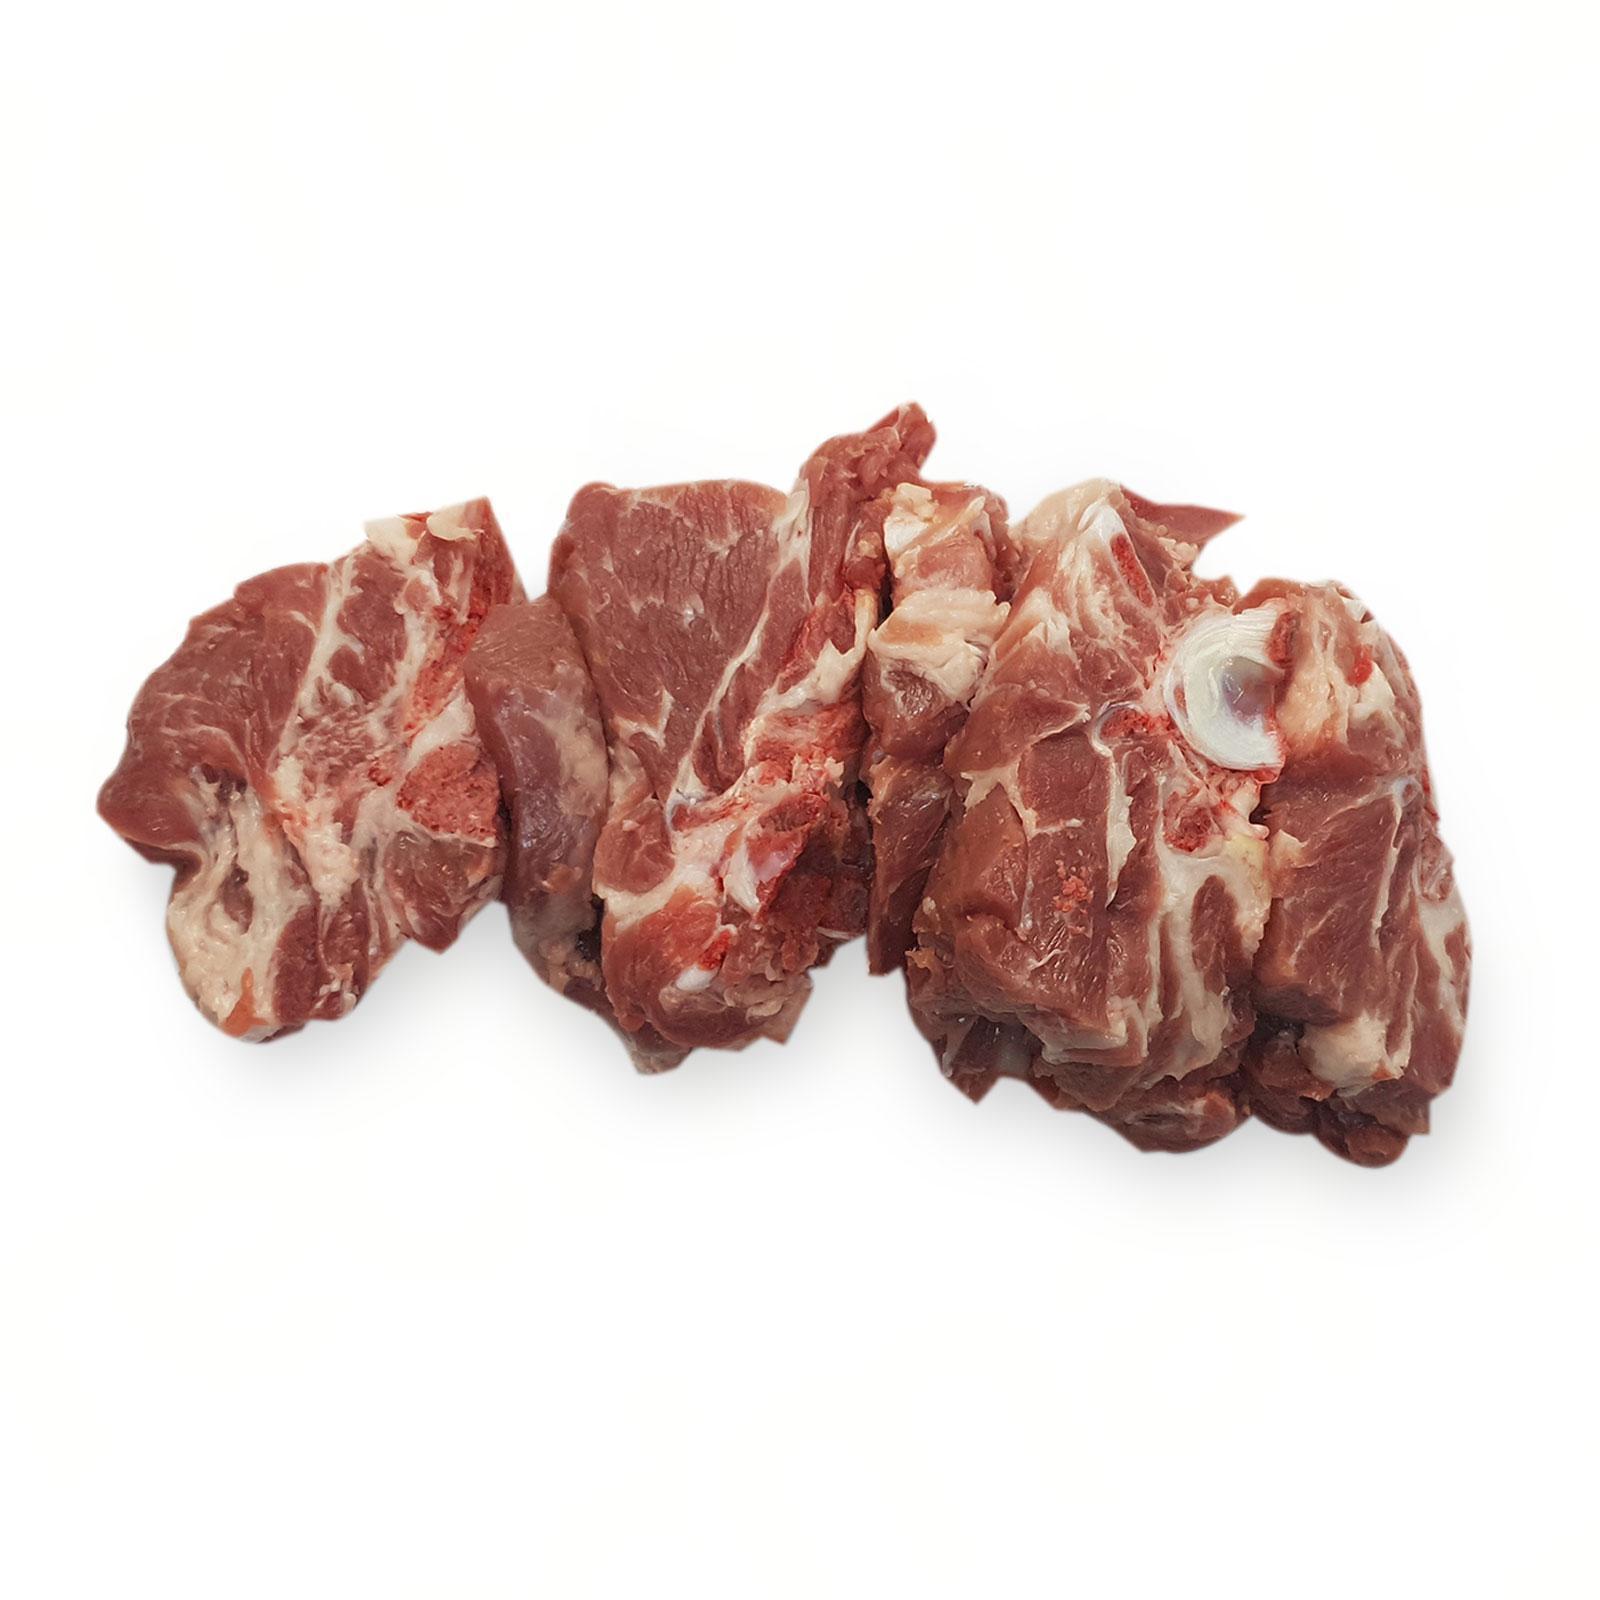 AW'S Market Pork Collar W/ Bone